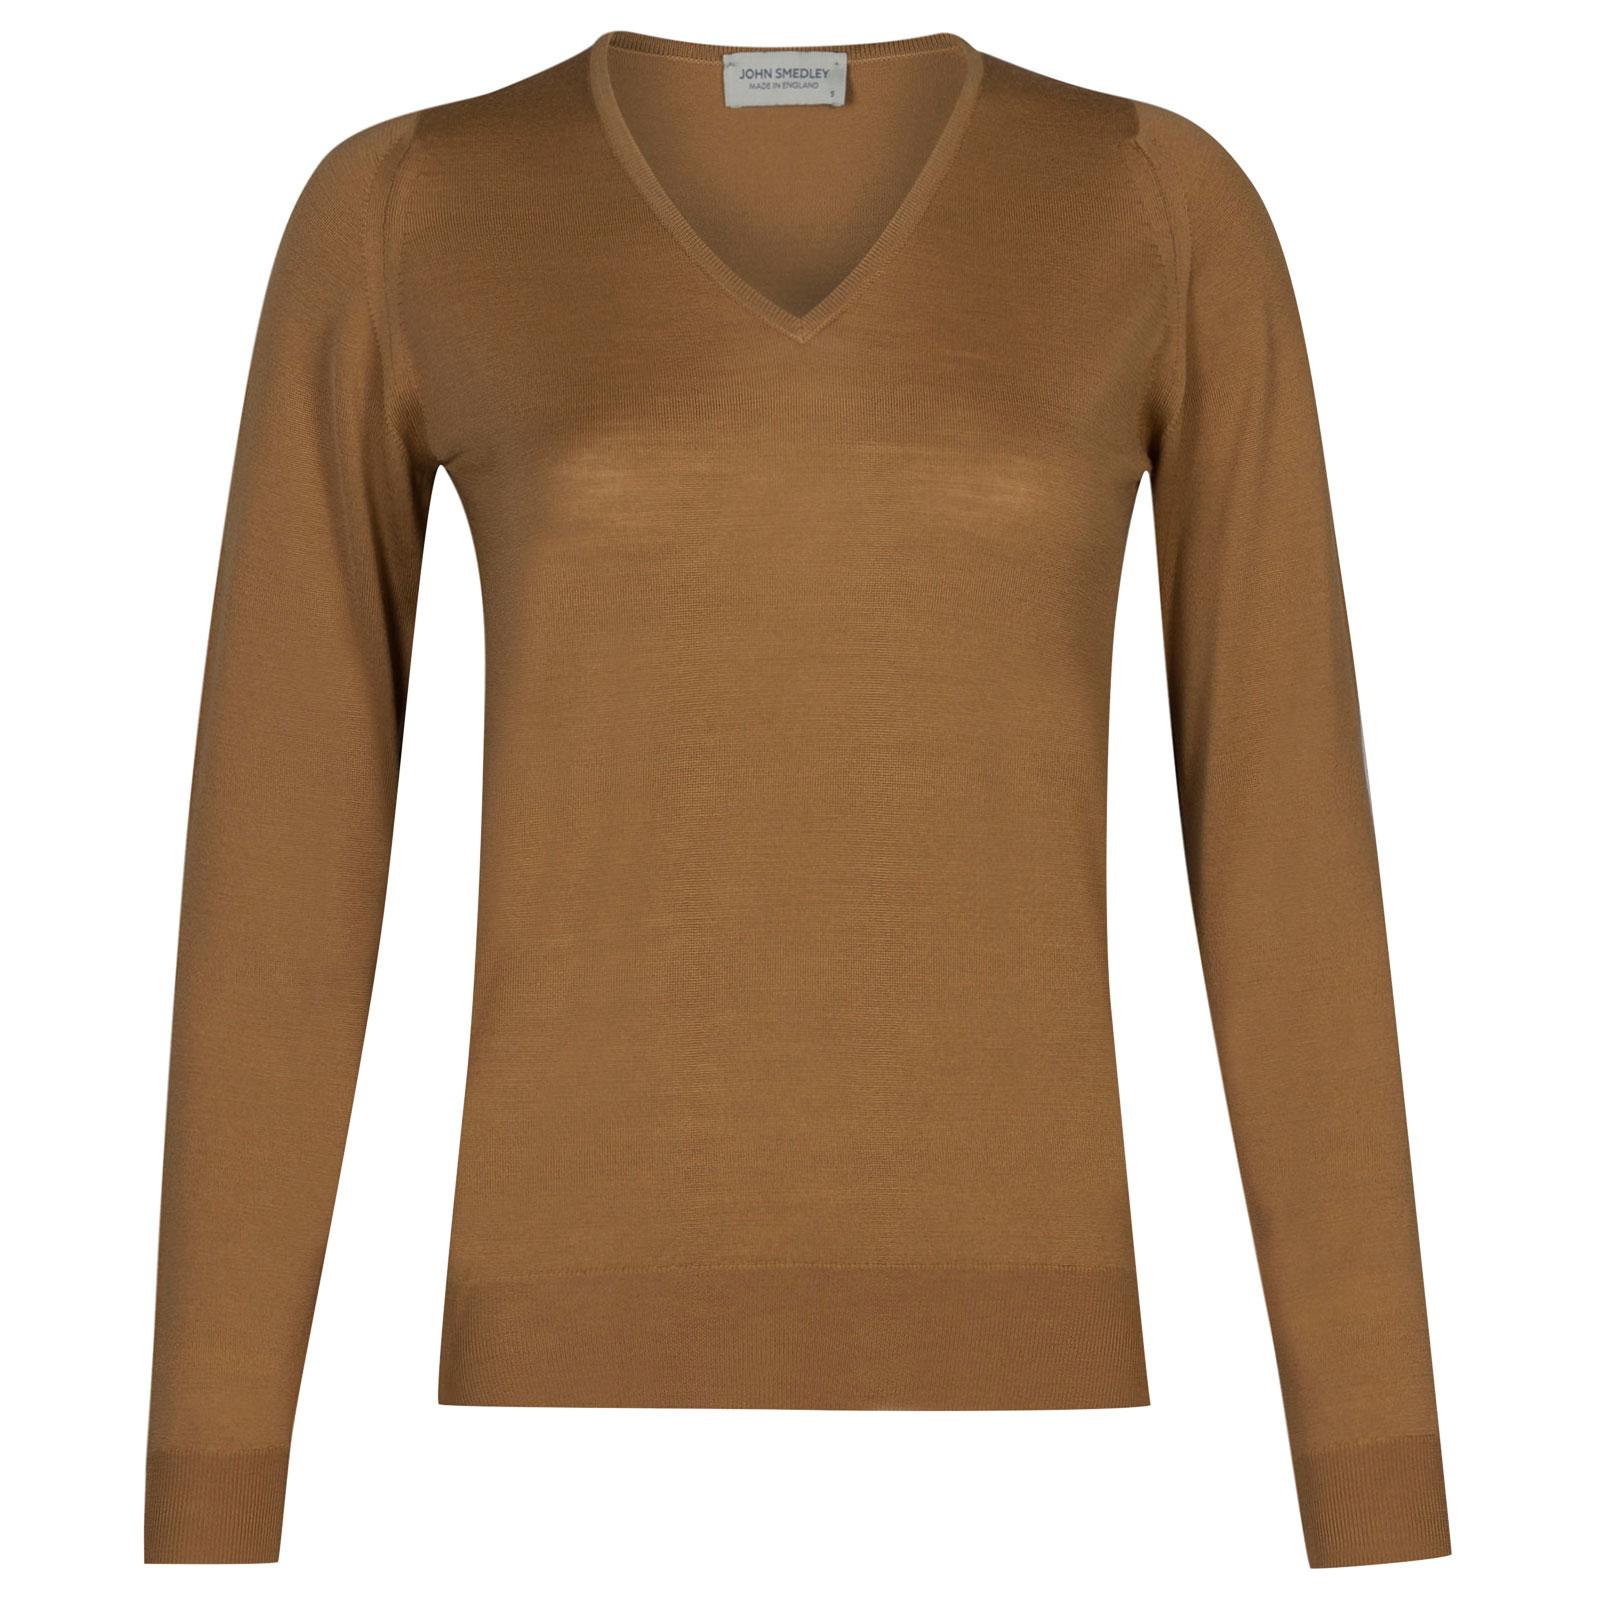 John Smedley manarola Merino Wool Sweater in Camel-S